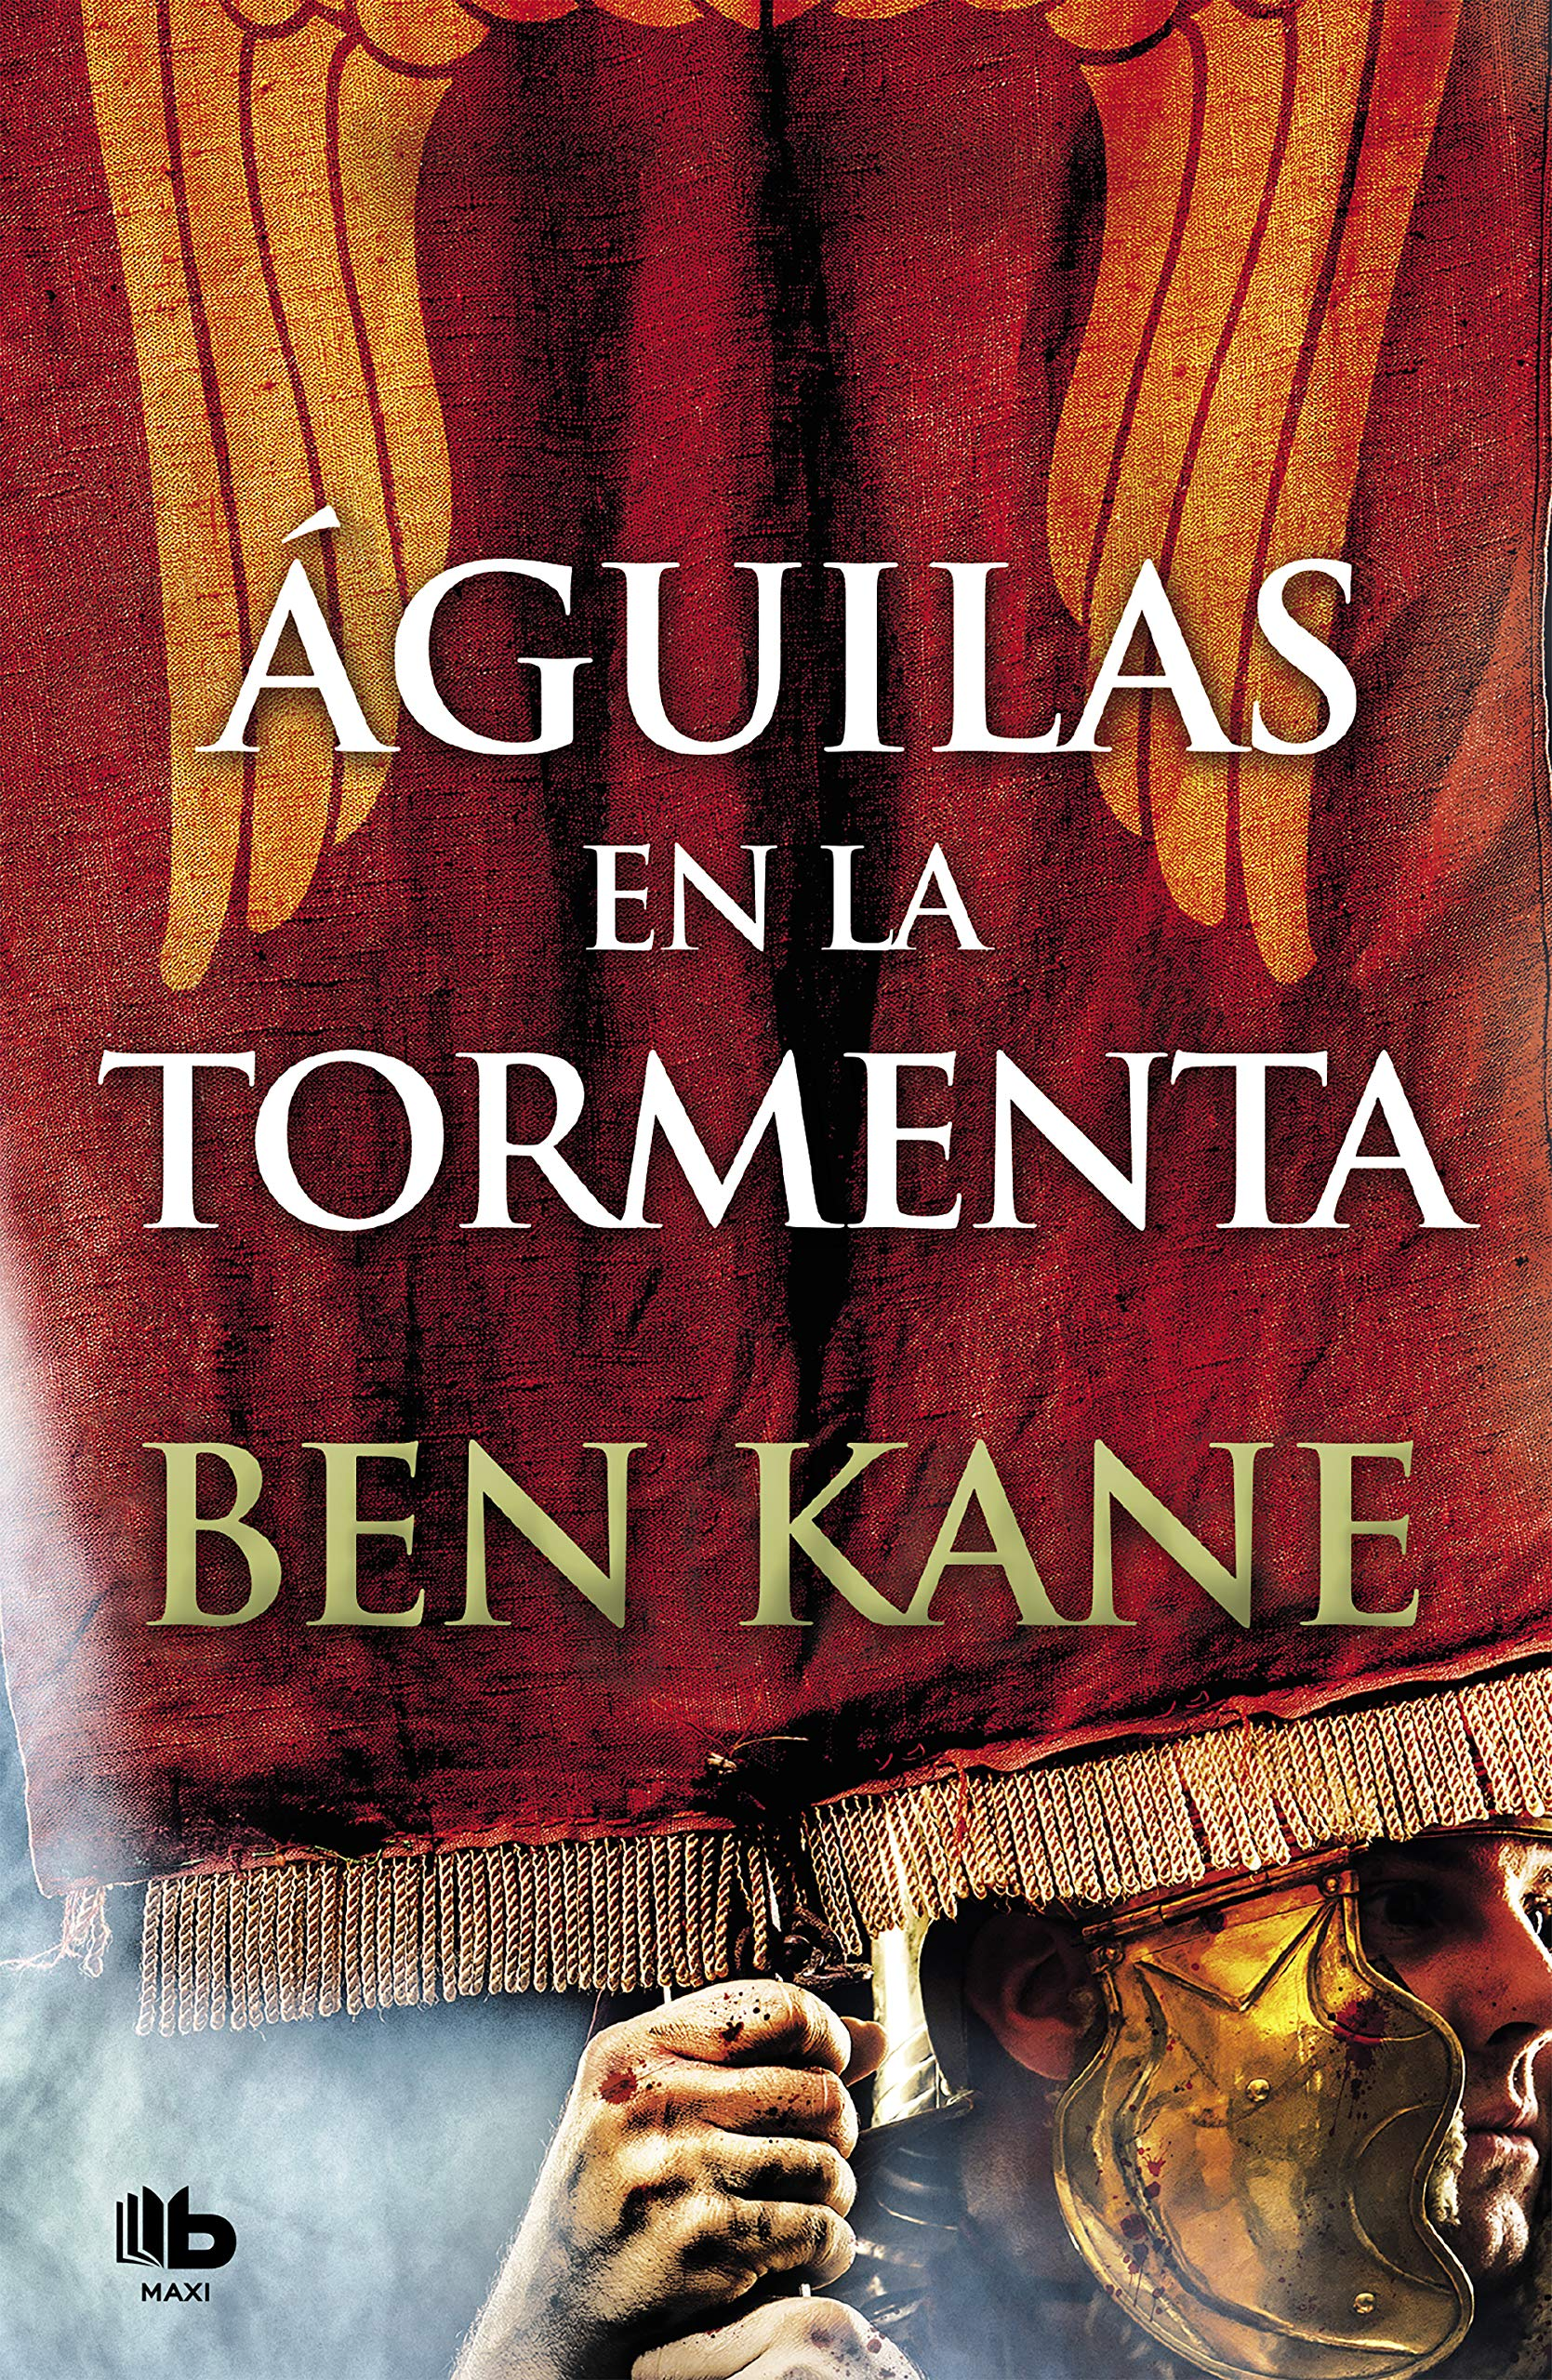 Águilas en la tormenta (Águilas de Roma 3) (MAXI) Tapa blanda – 22 nov 2018 Ben Kane B de Bolsillo (Ediciones B) 8490707103 FICTION / War & Military